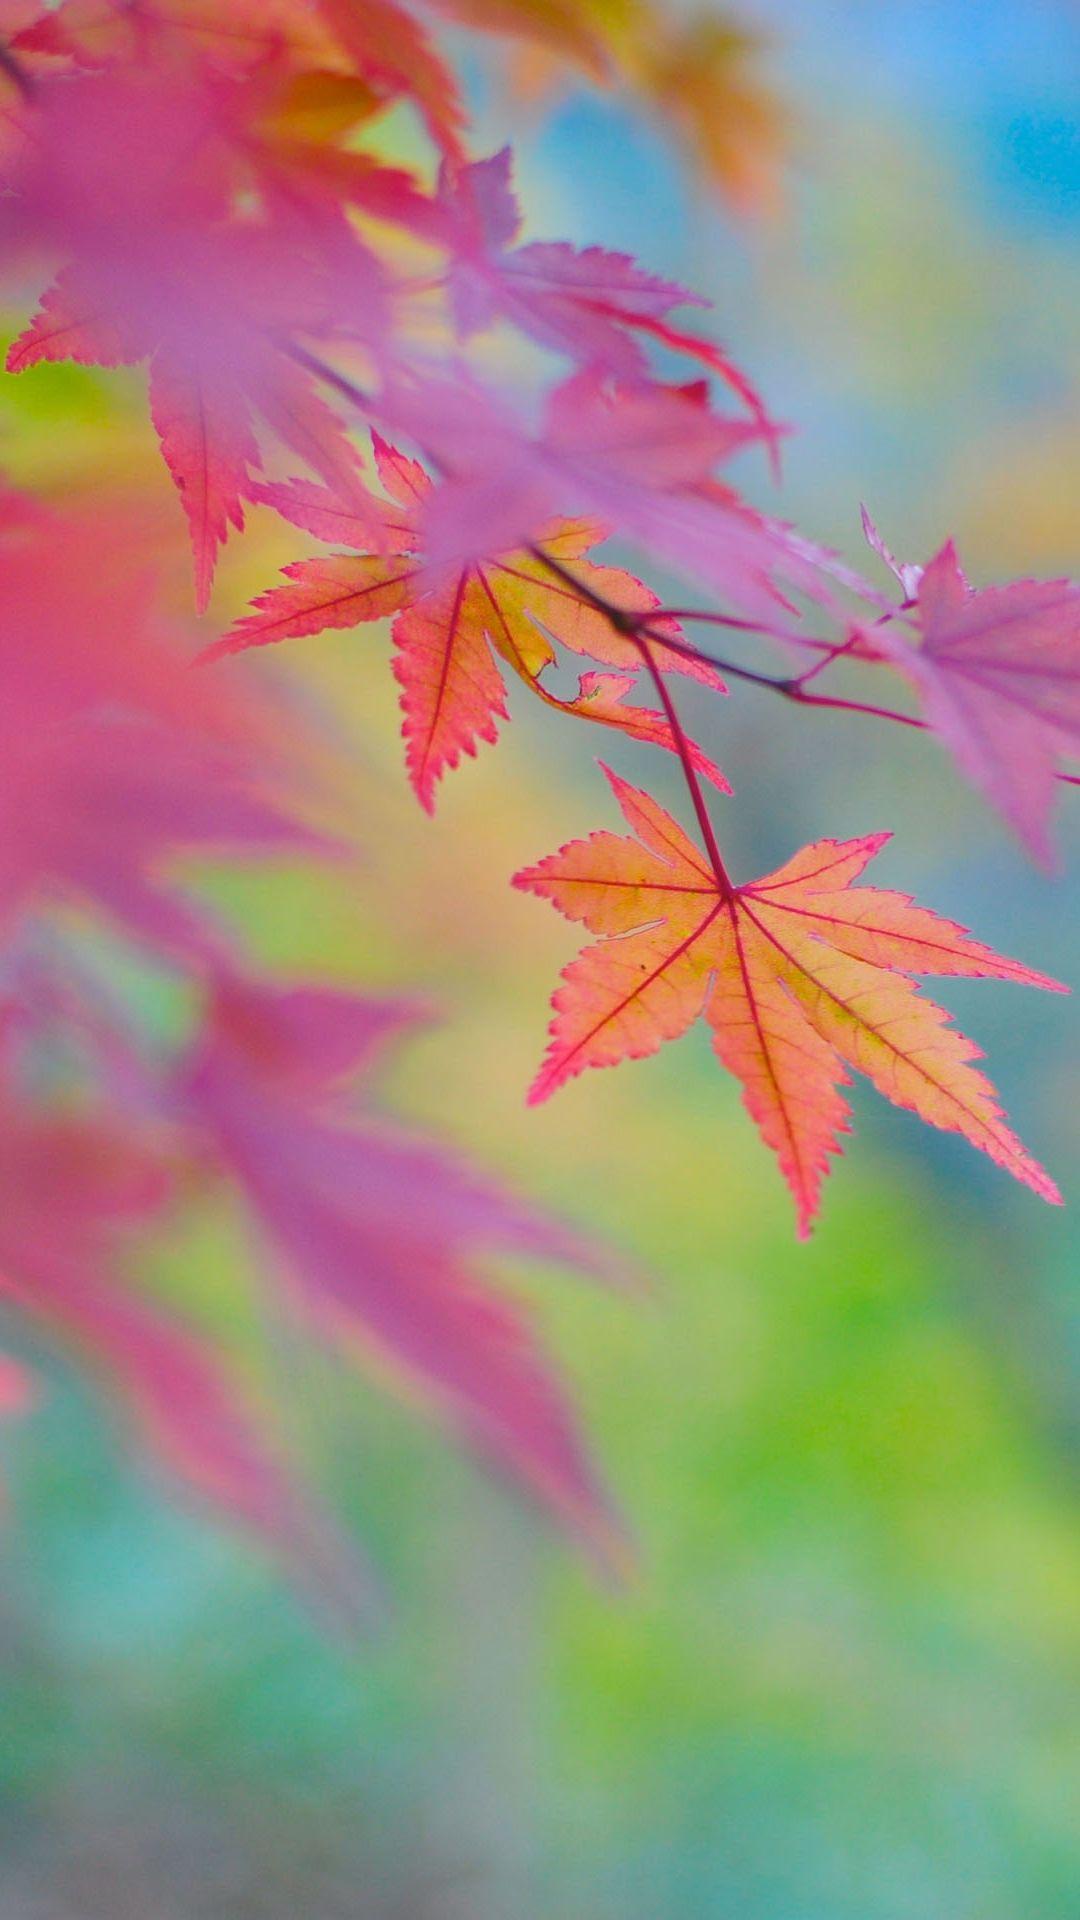 Fondos De Pantalla Suenos Buscar Con Google Autumn Leaves Wallpaper Autumn Leaves Background Fall Wallpaper